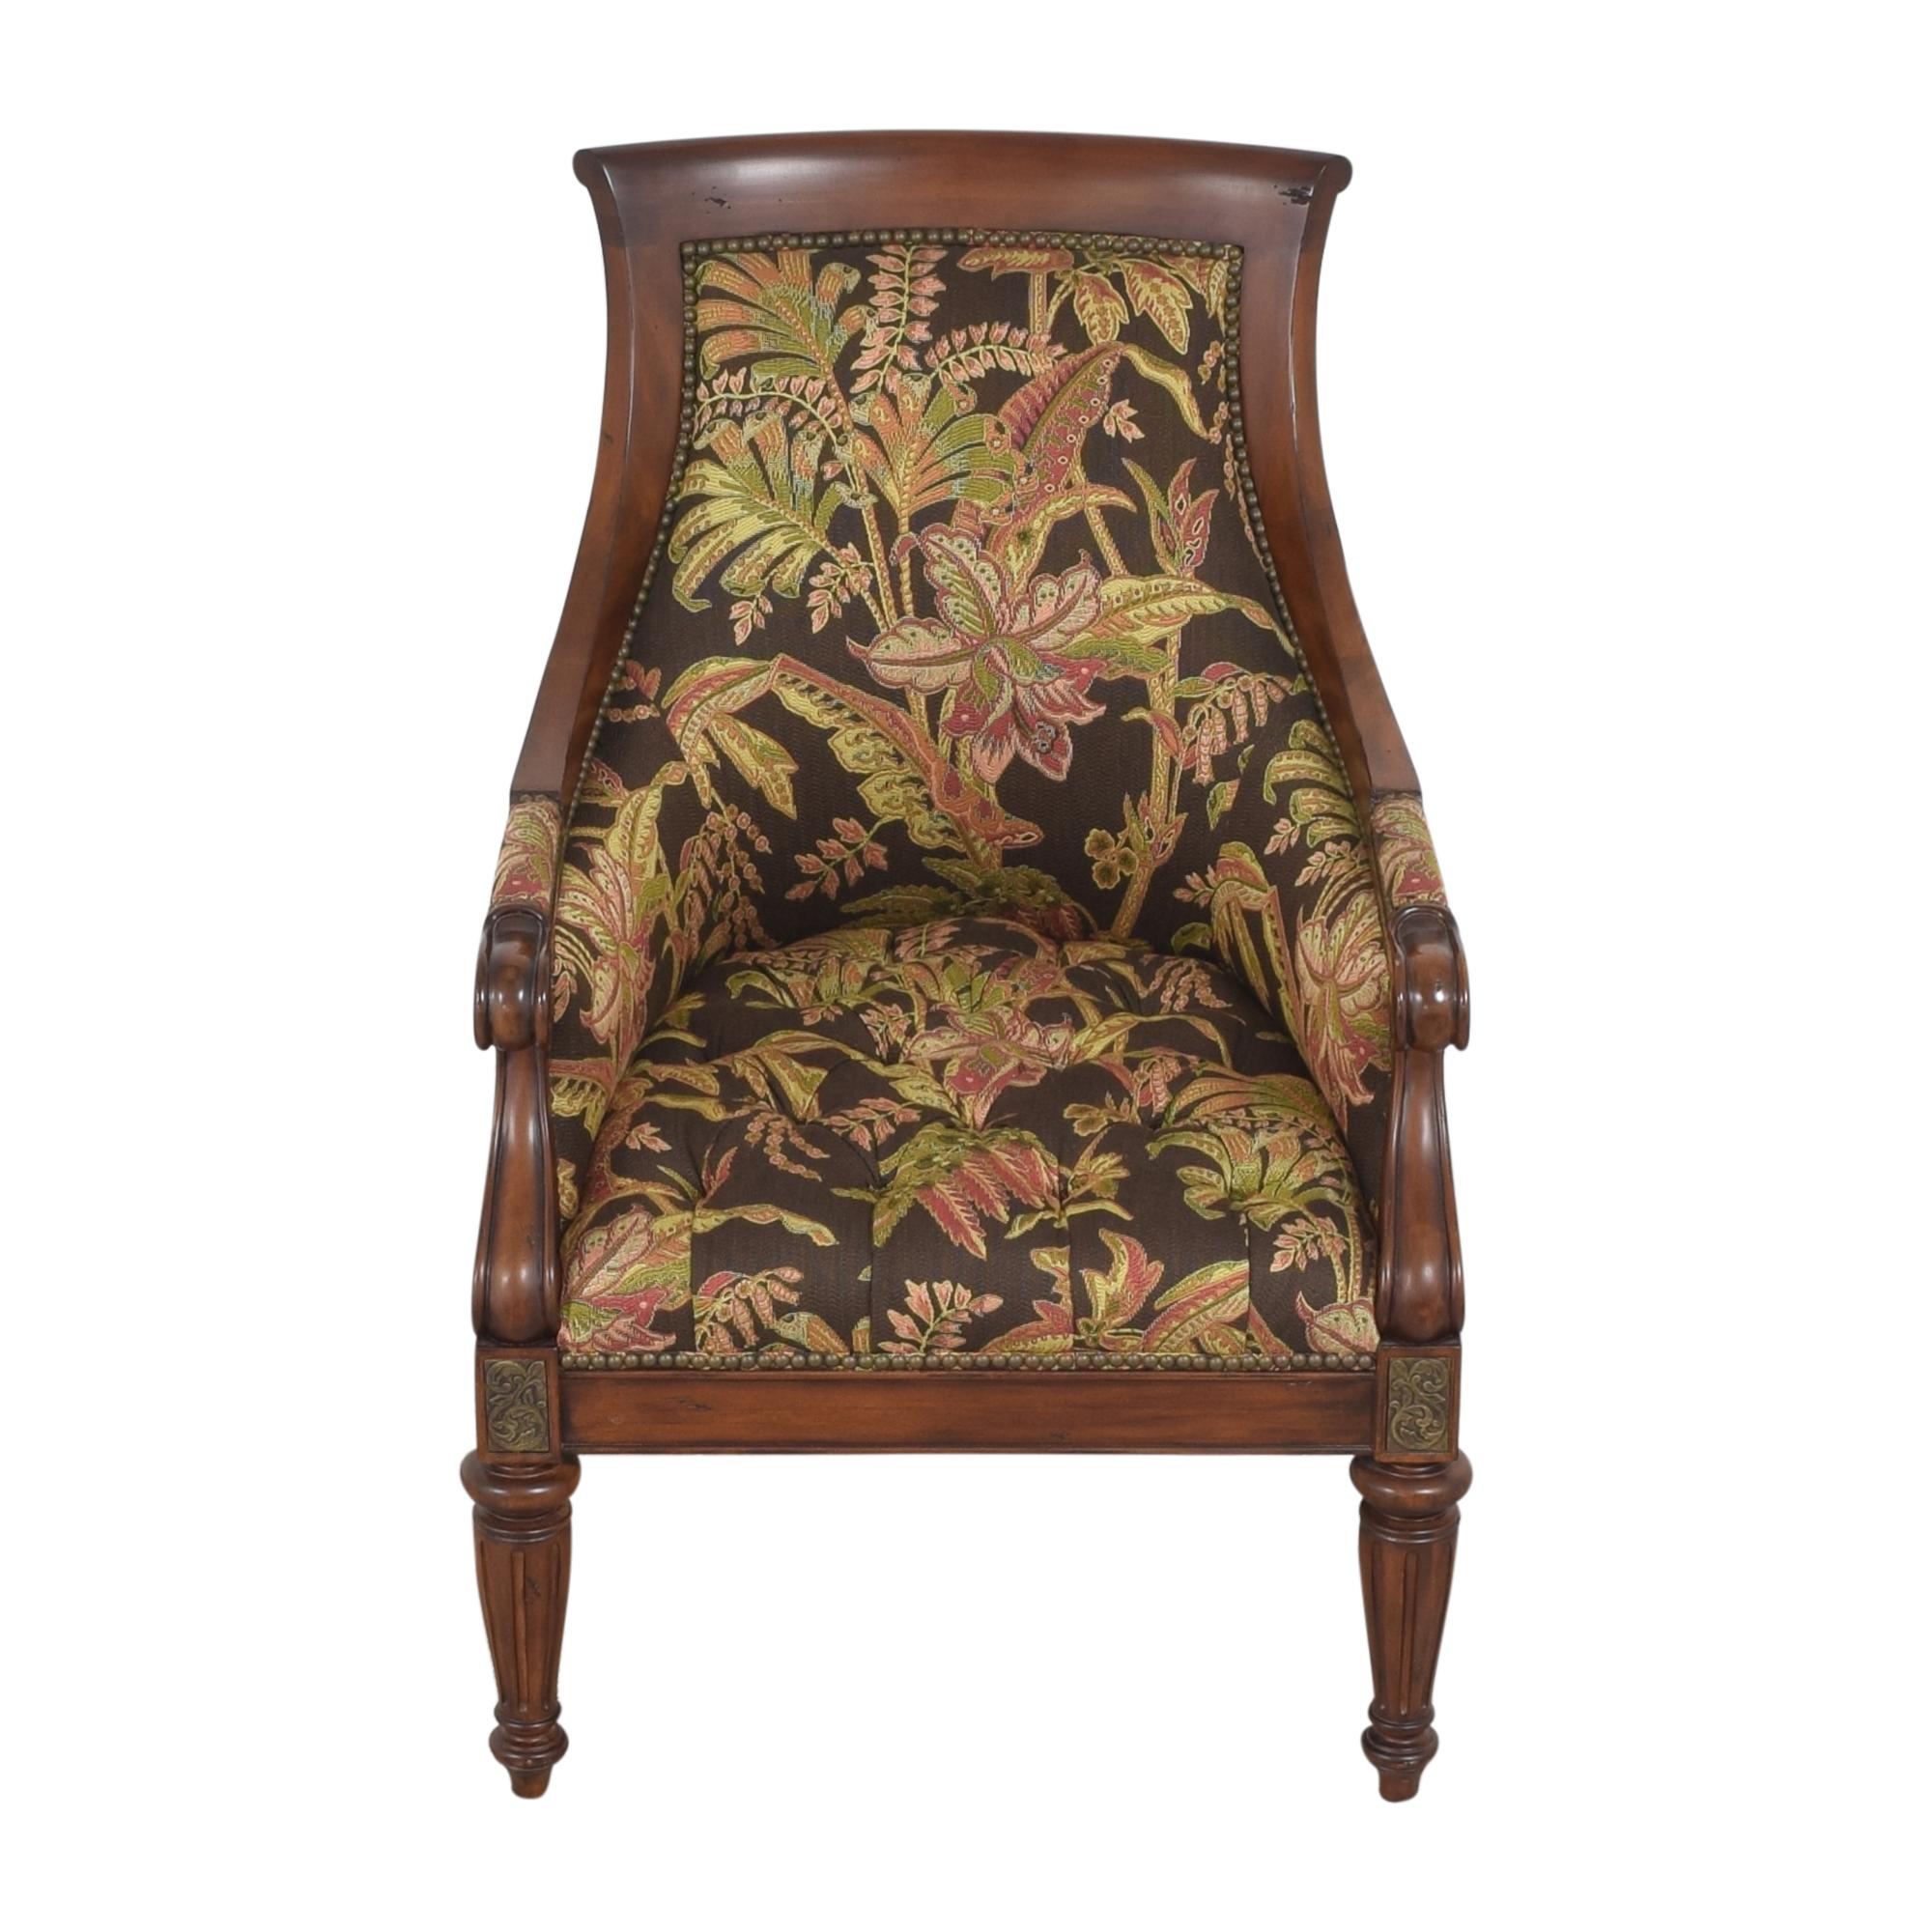 buy Thomasville Ernest Hemingway Anson Accent Chair Thomasville